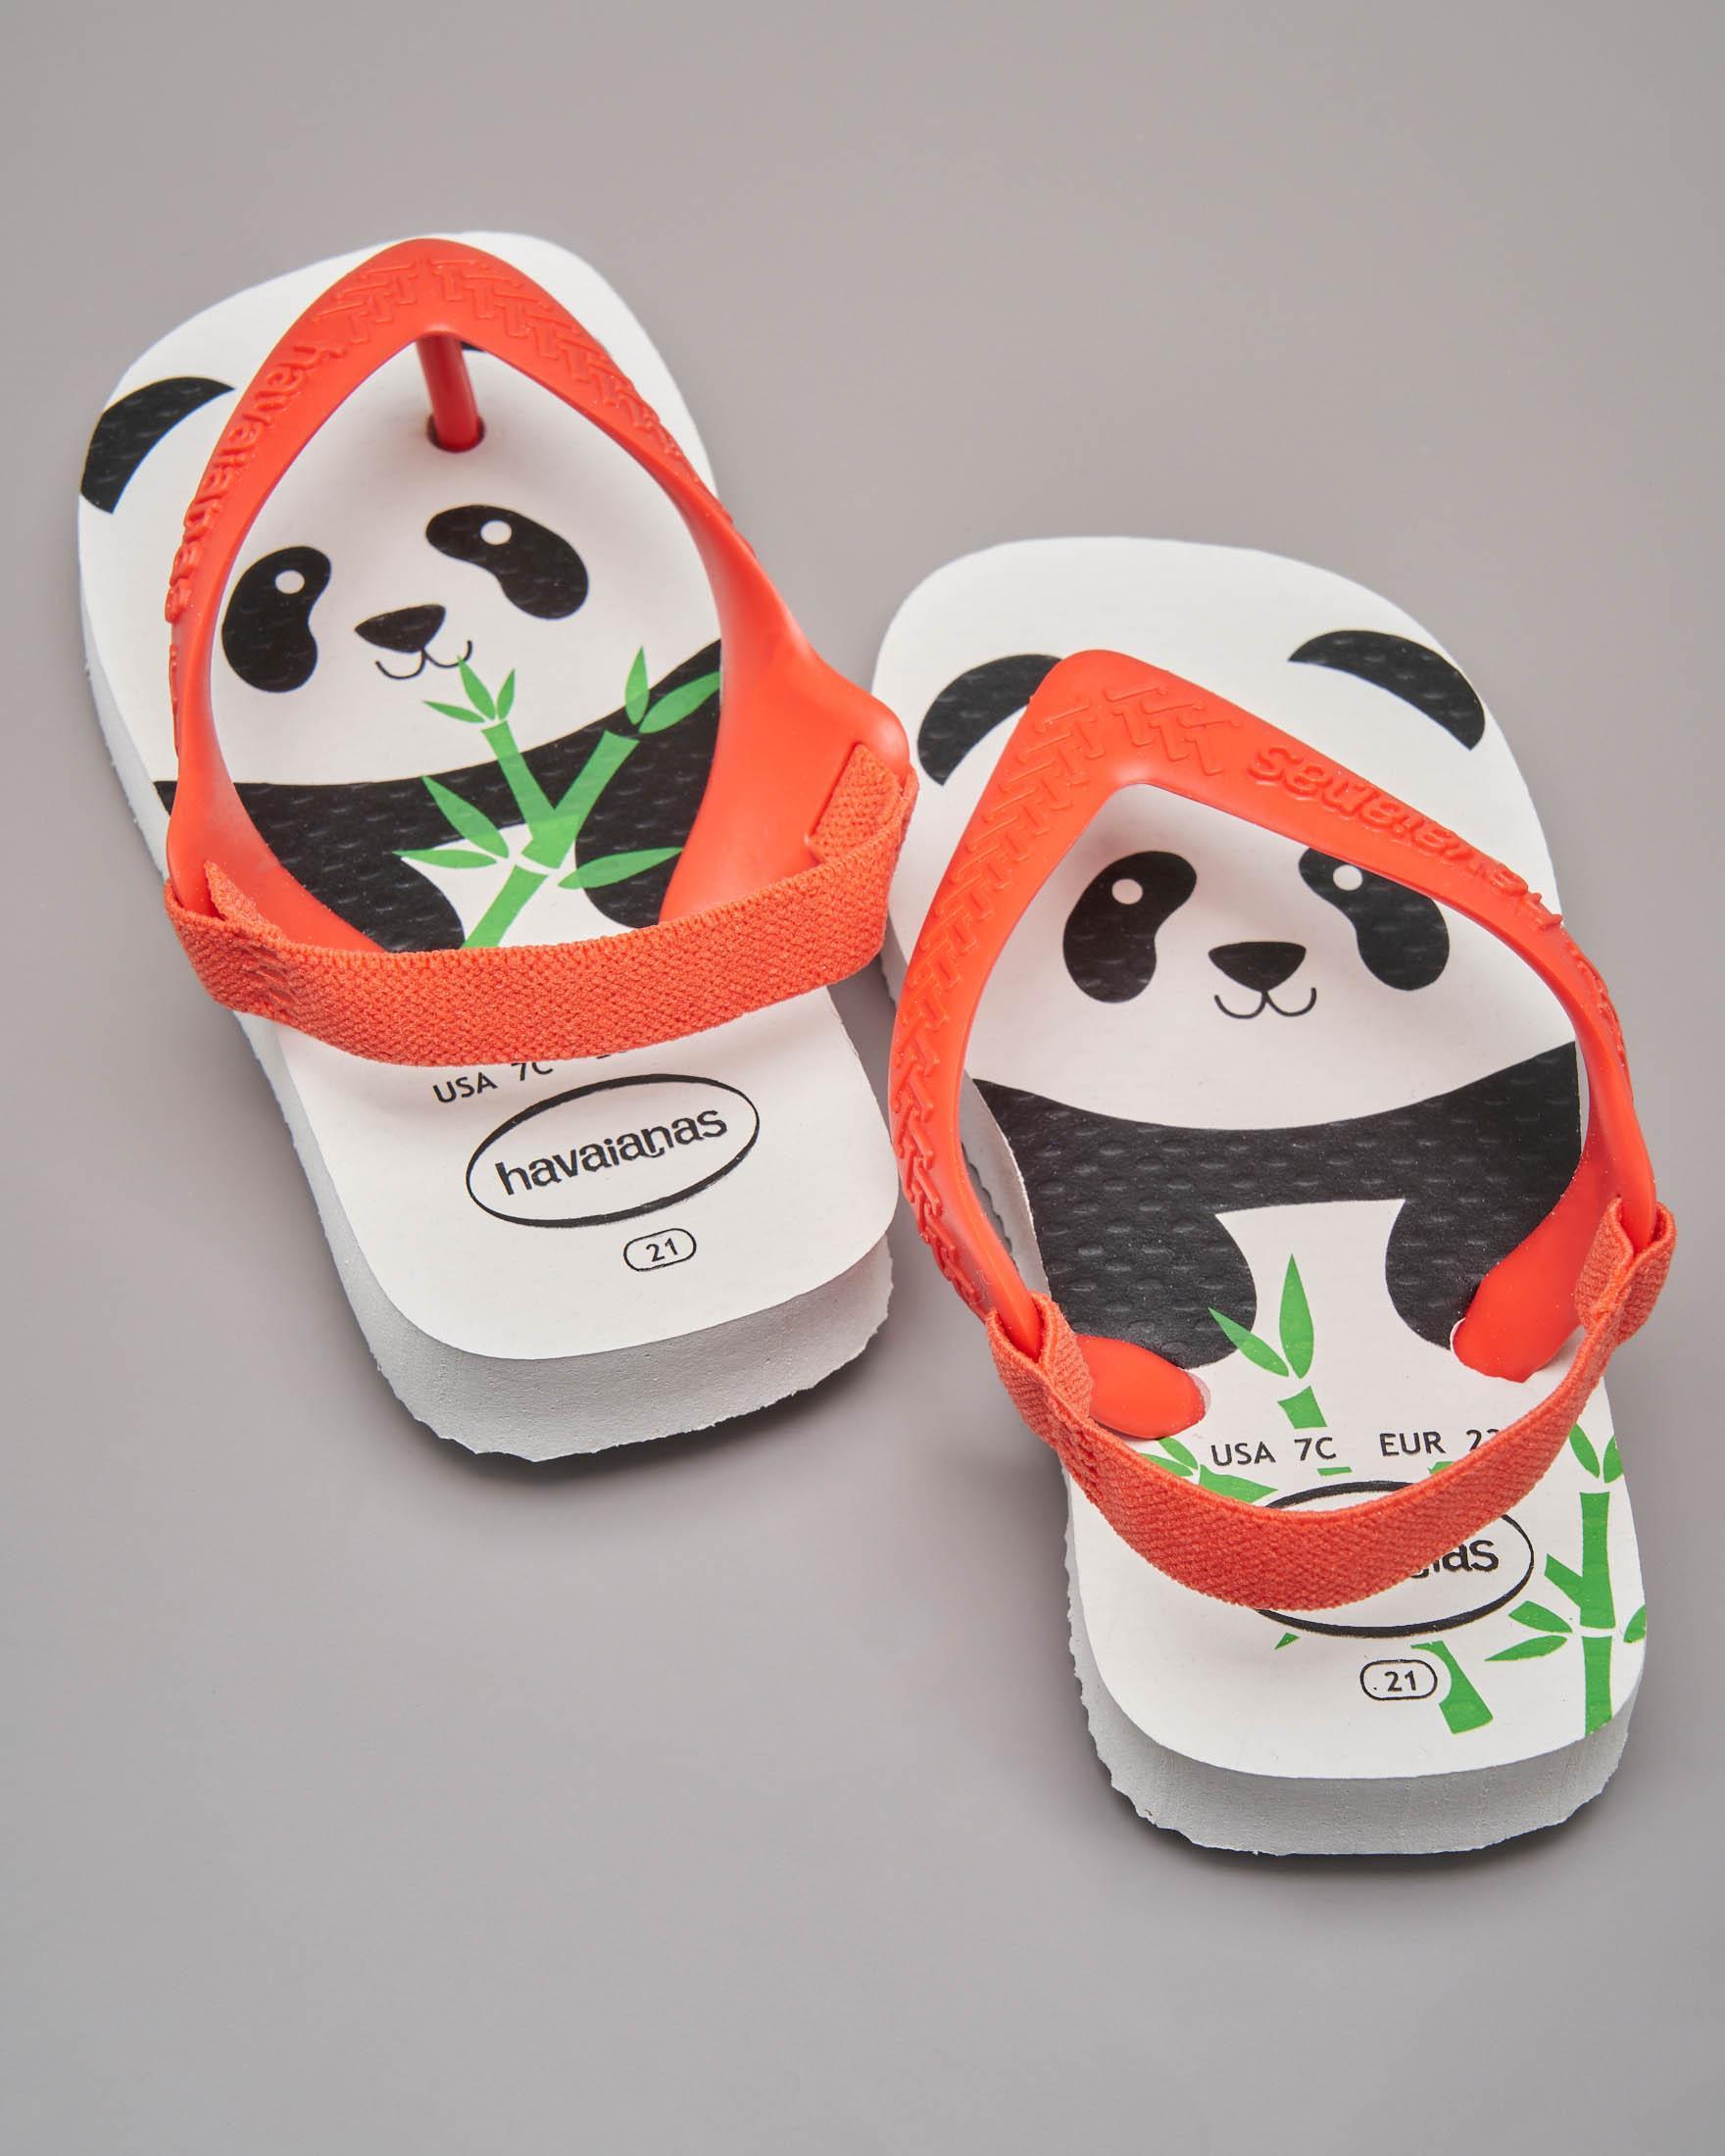 Havaianas bianca con stampa panda